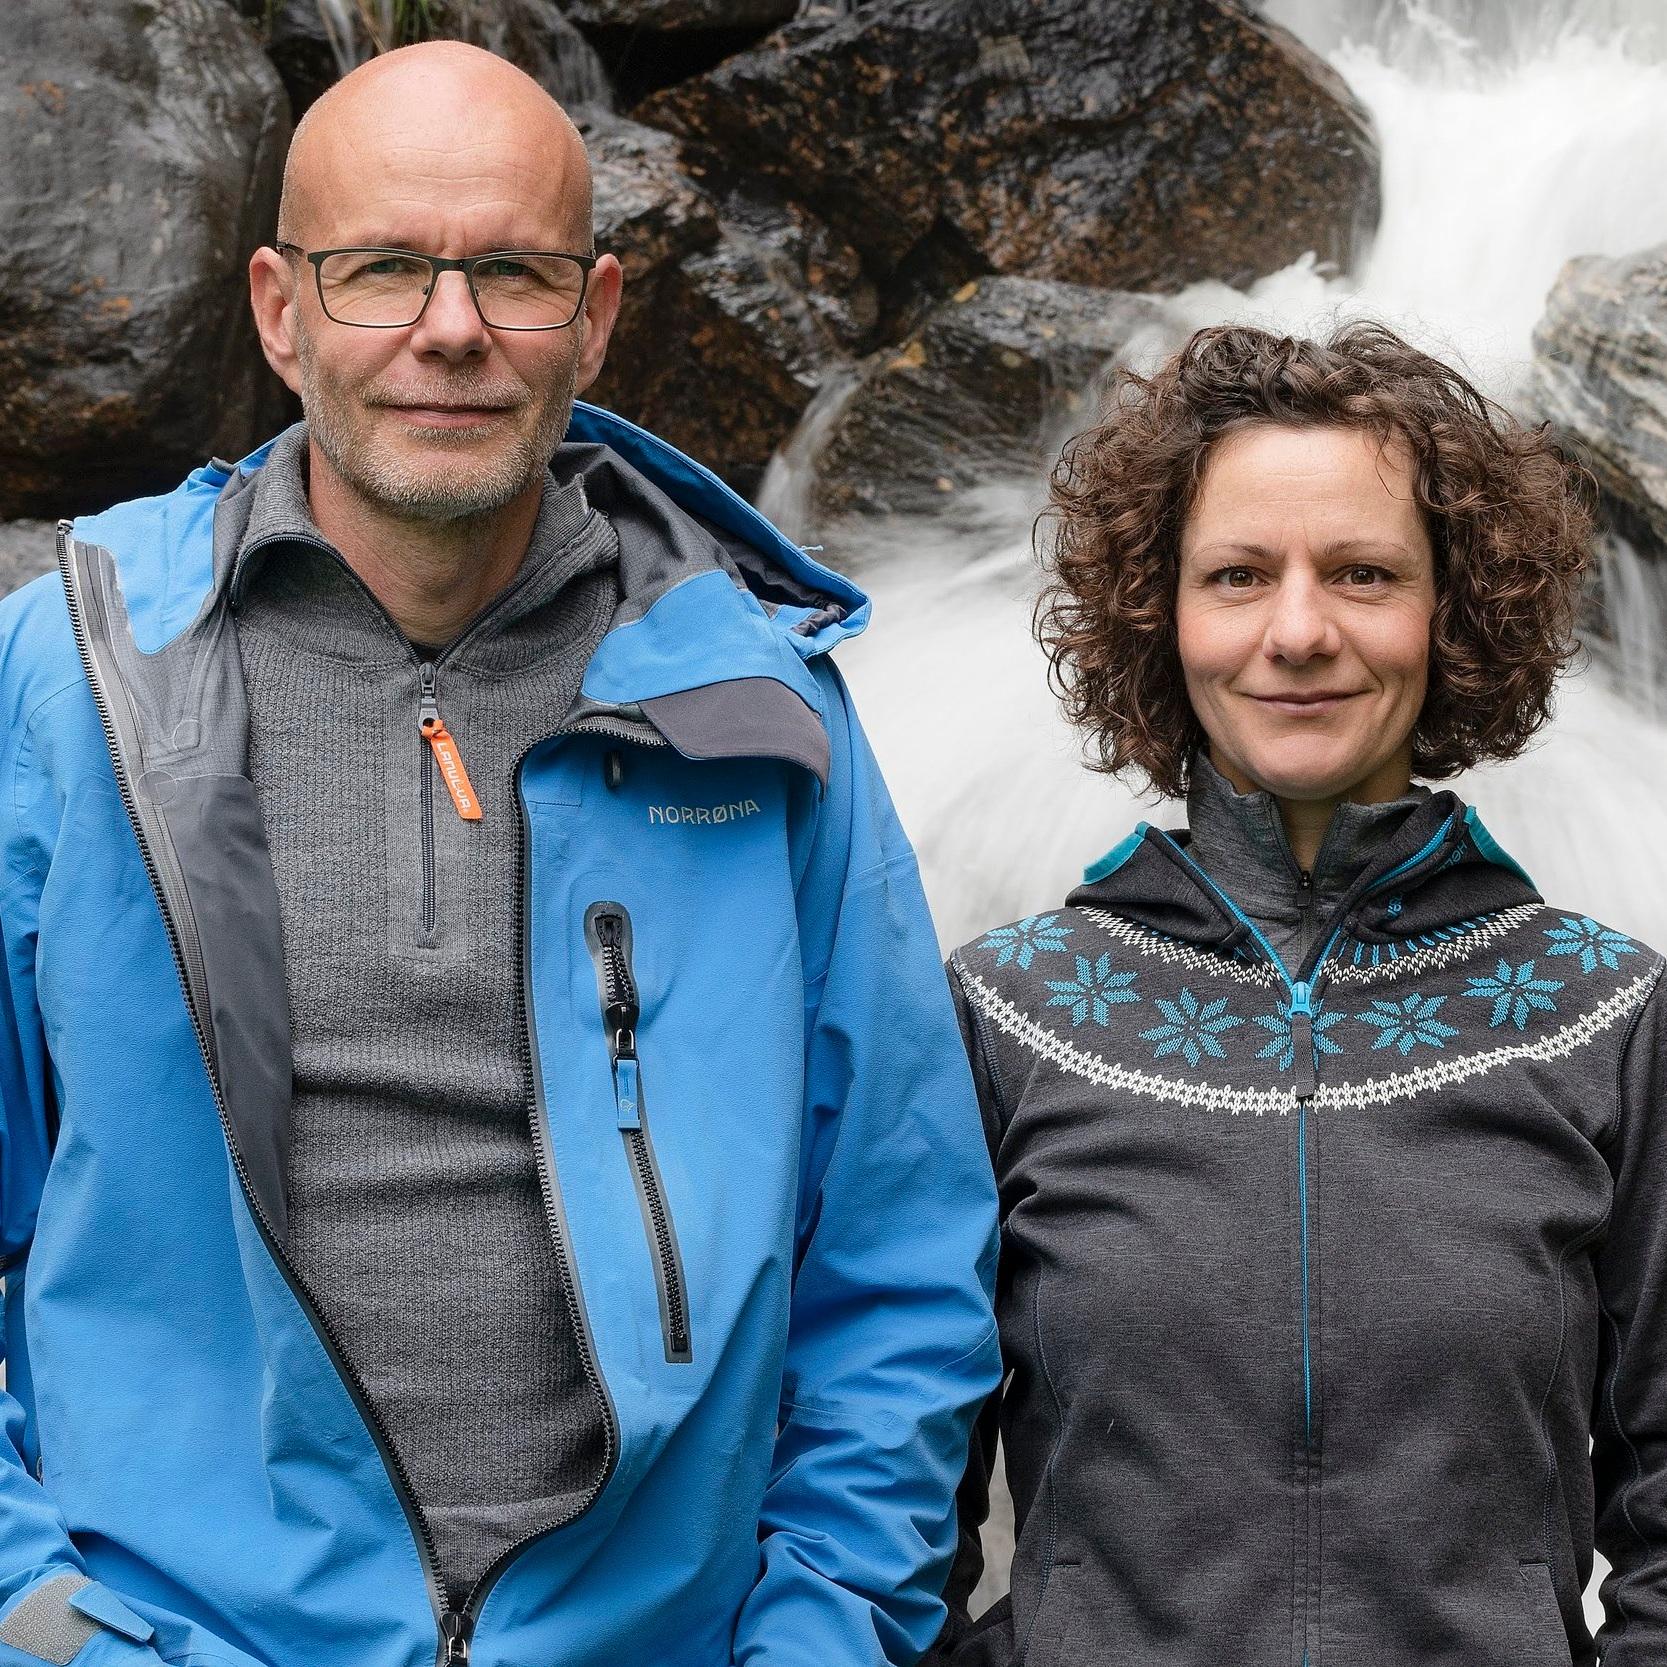 Erlend og Orsolya Haarberg - Naturfotografer